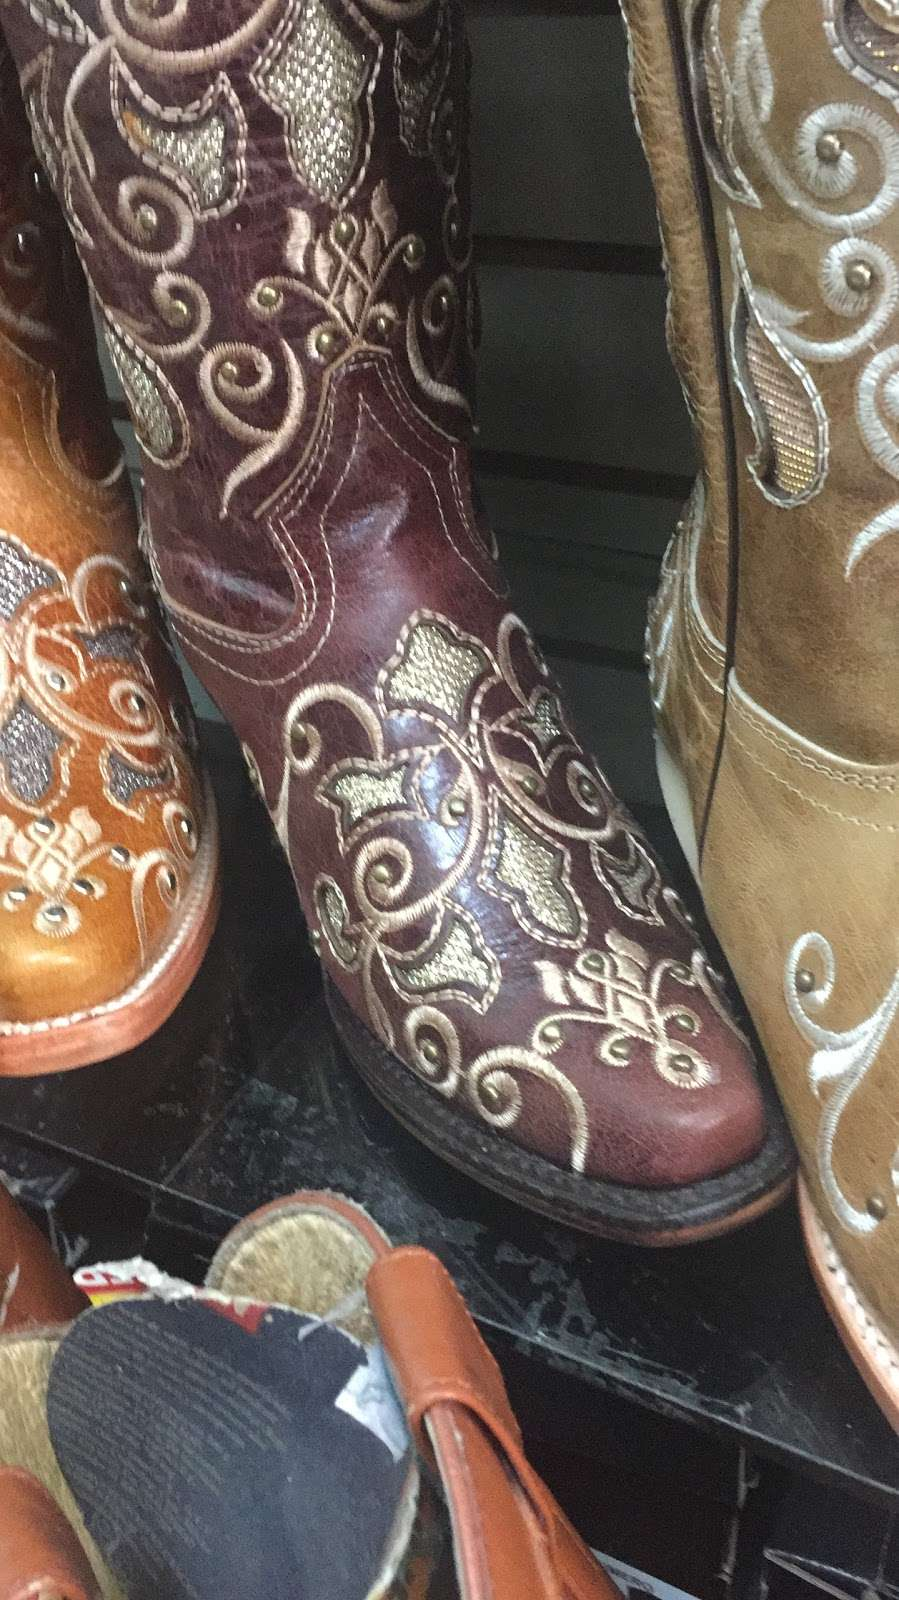 Vaquero Boots - clothing store  | Photo 4 of 4 | Address: 2342 Alum Rock Ave, San Jose, CA 95116, USA | Phone: (408) 926-7140